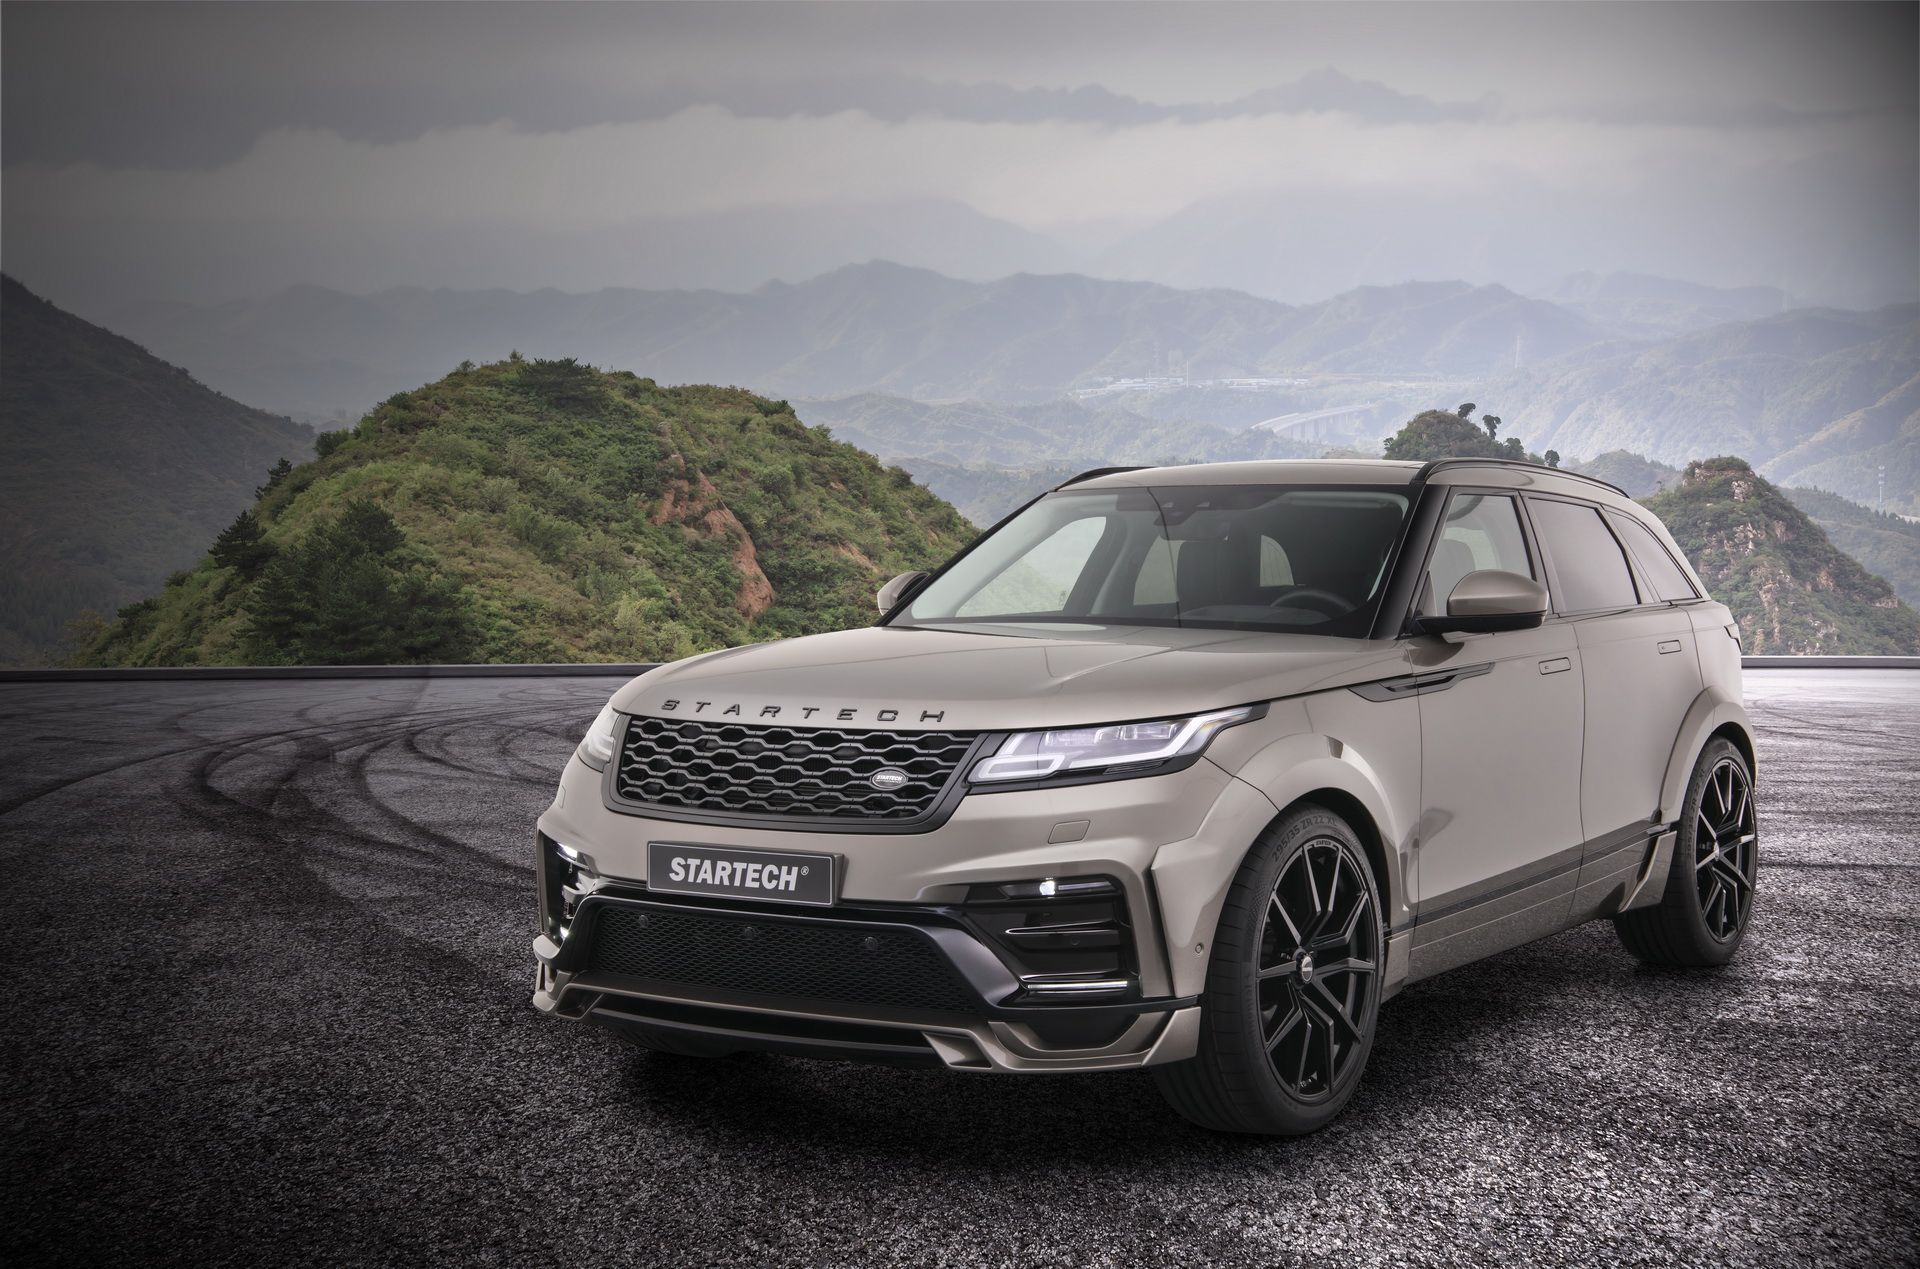 Widebody Range Rover Velar Is Startech's Geneva Showcar